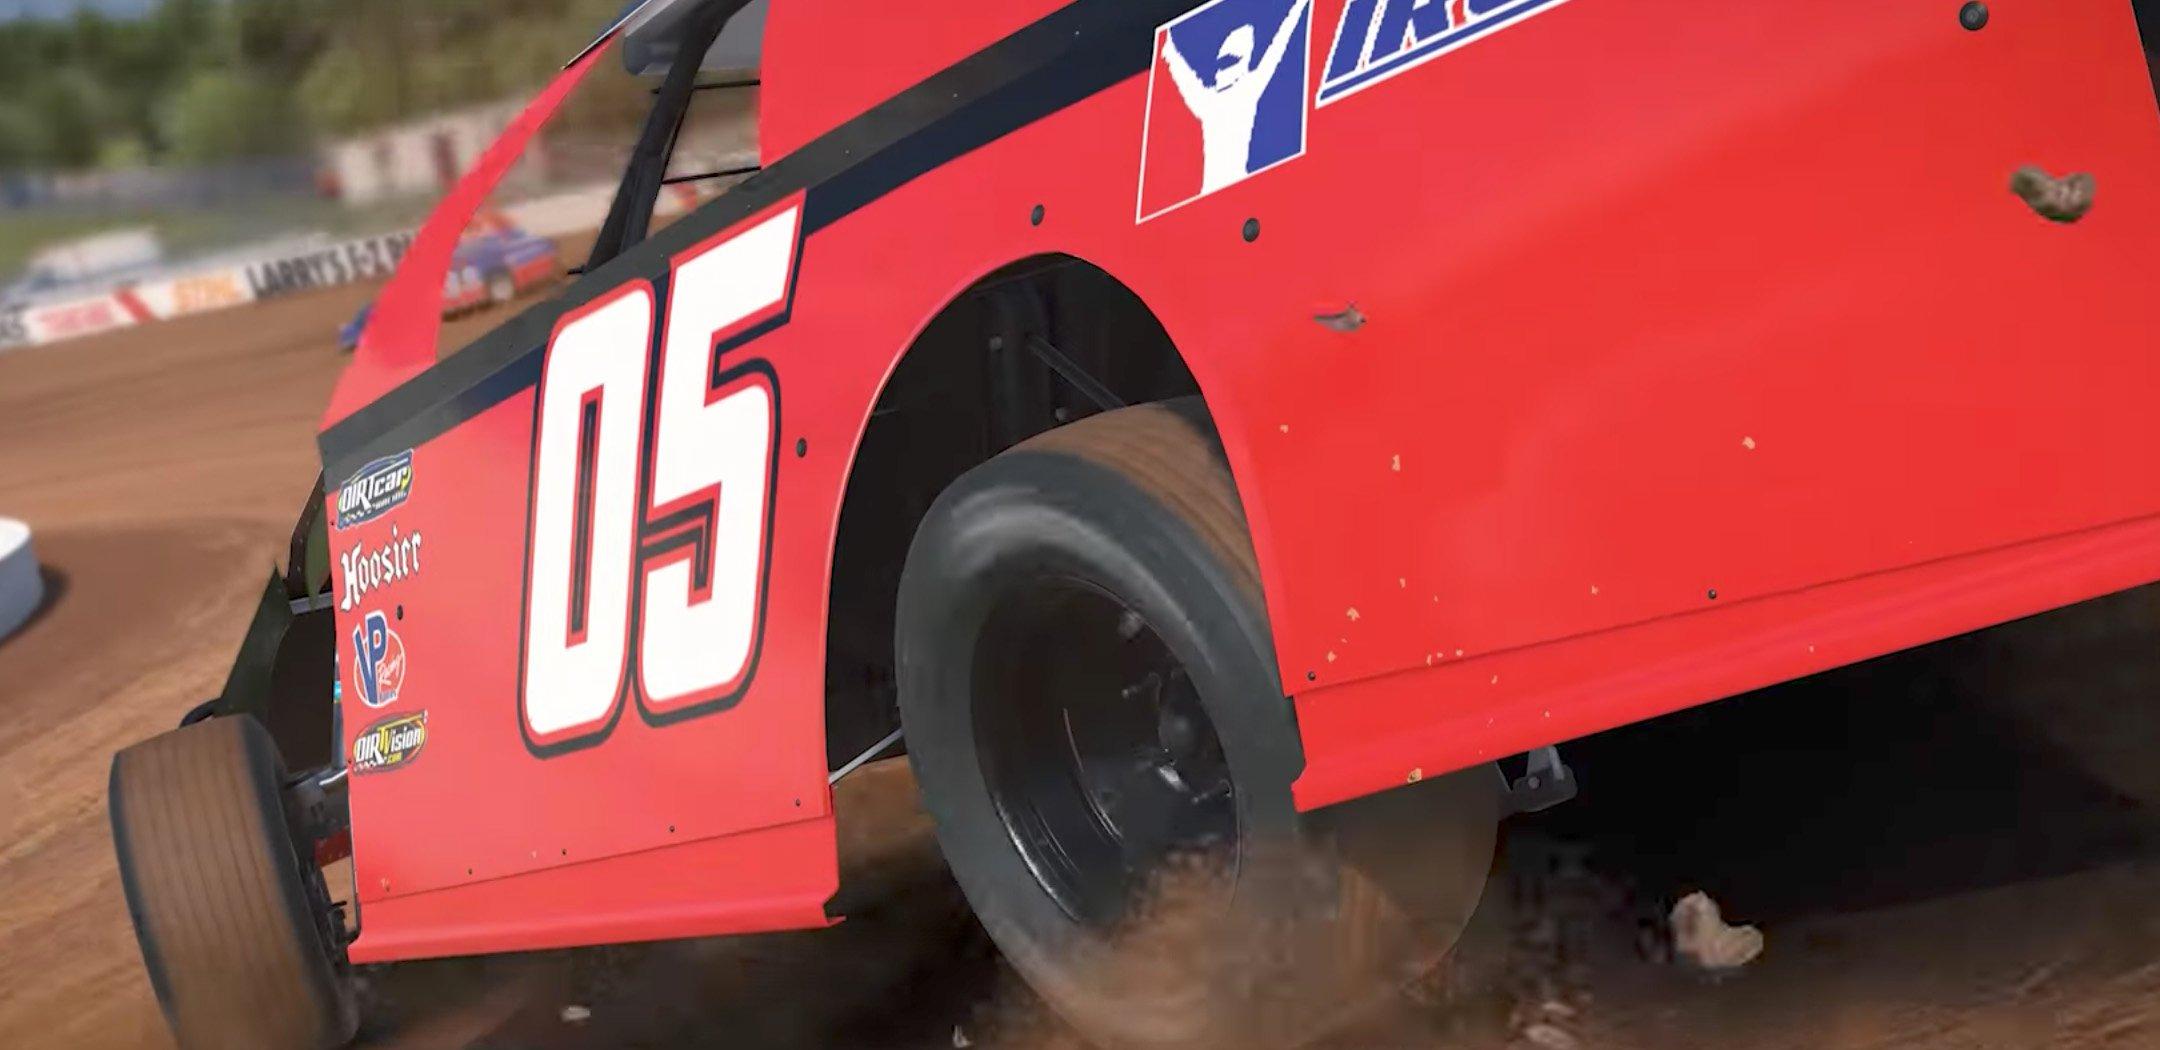 iRacing Dirt Modified Racing Game